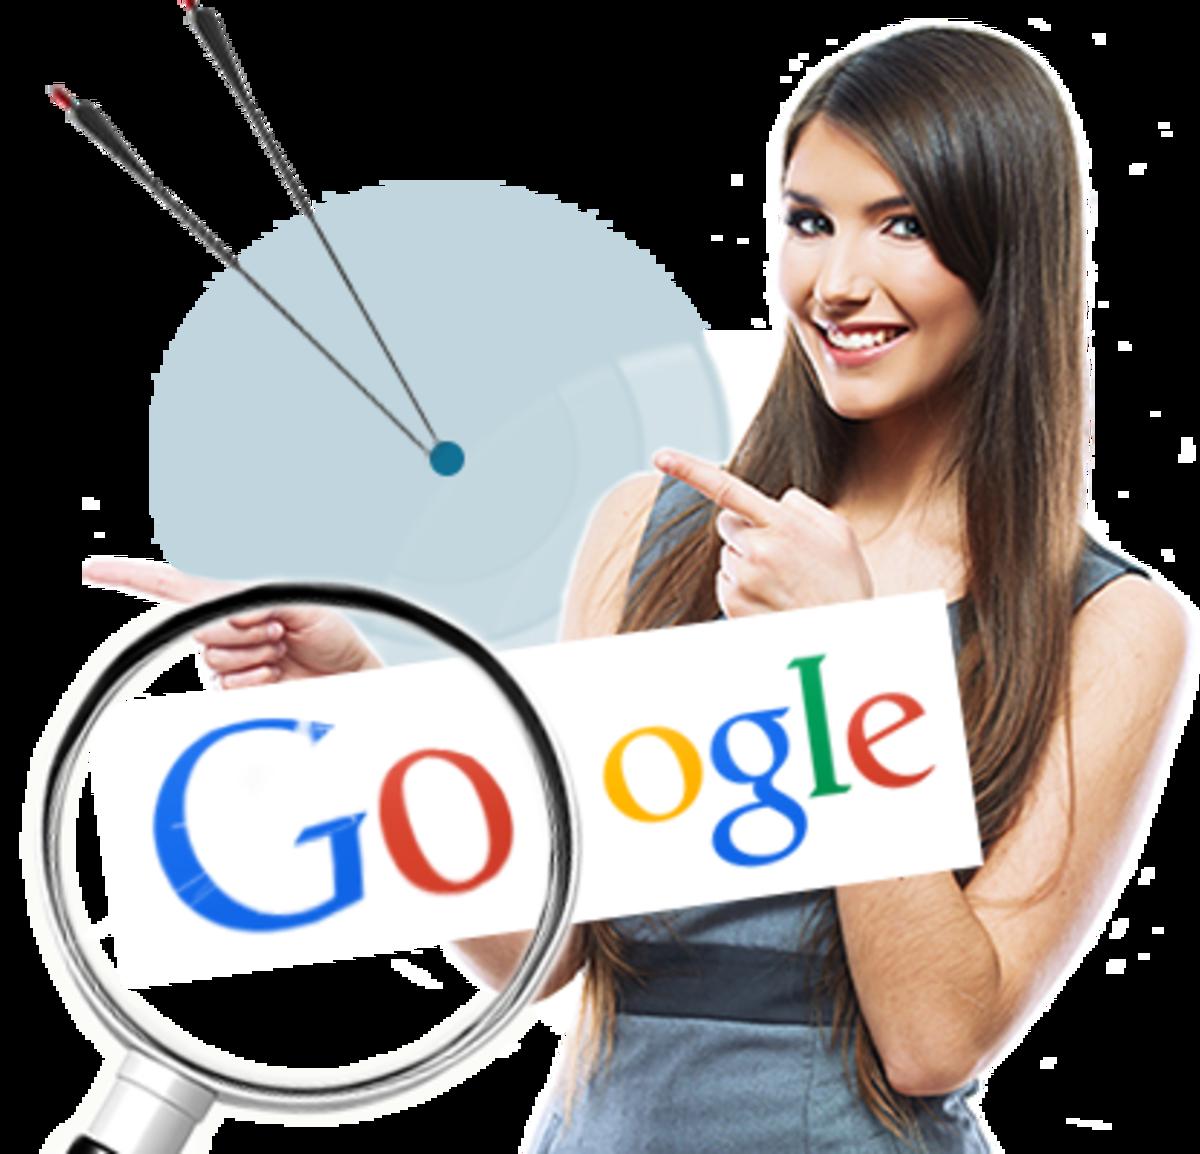 google adwords how to get more clicks